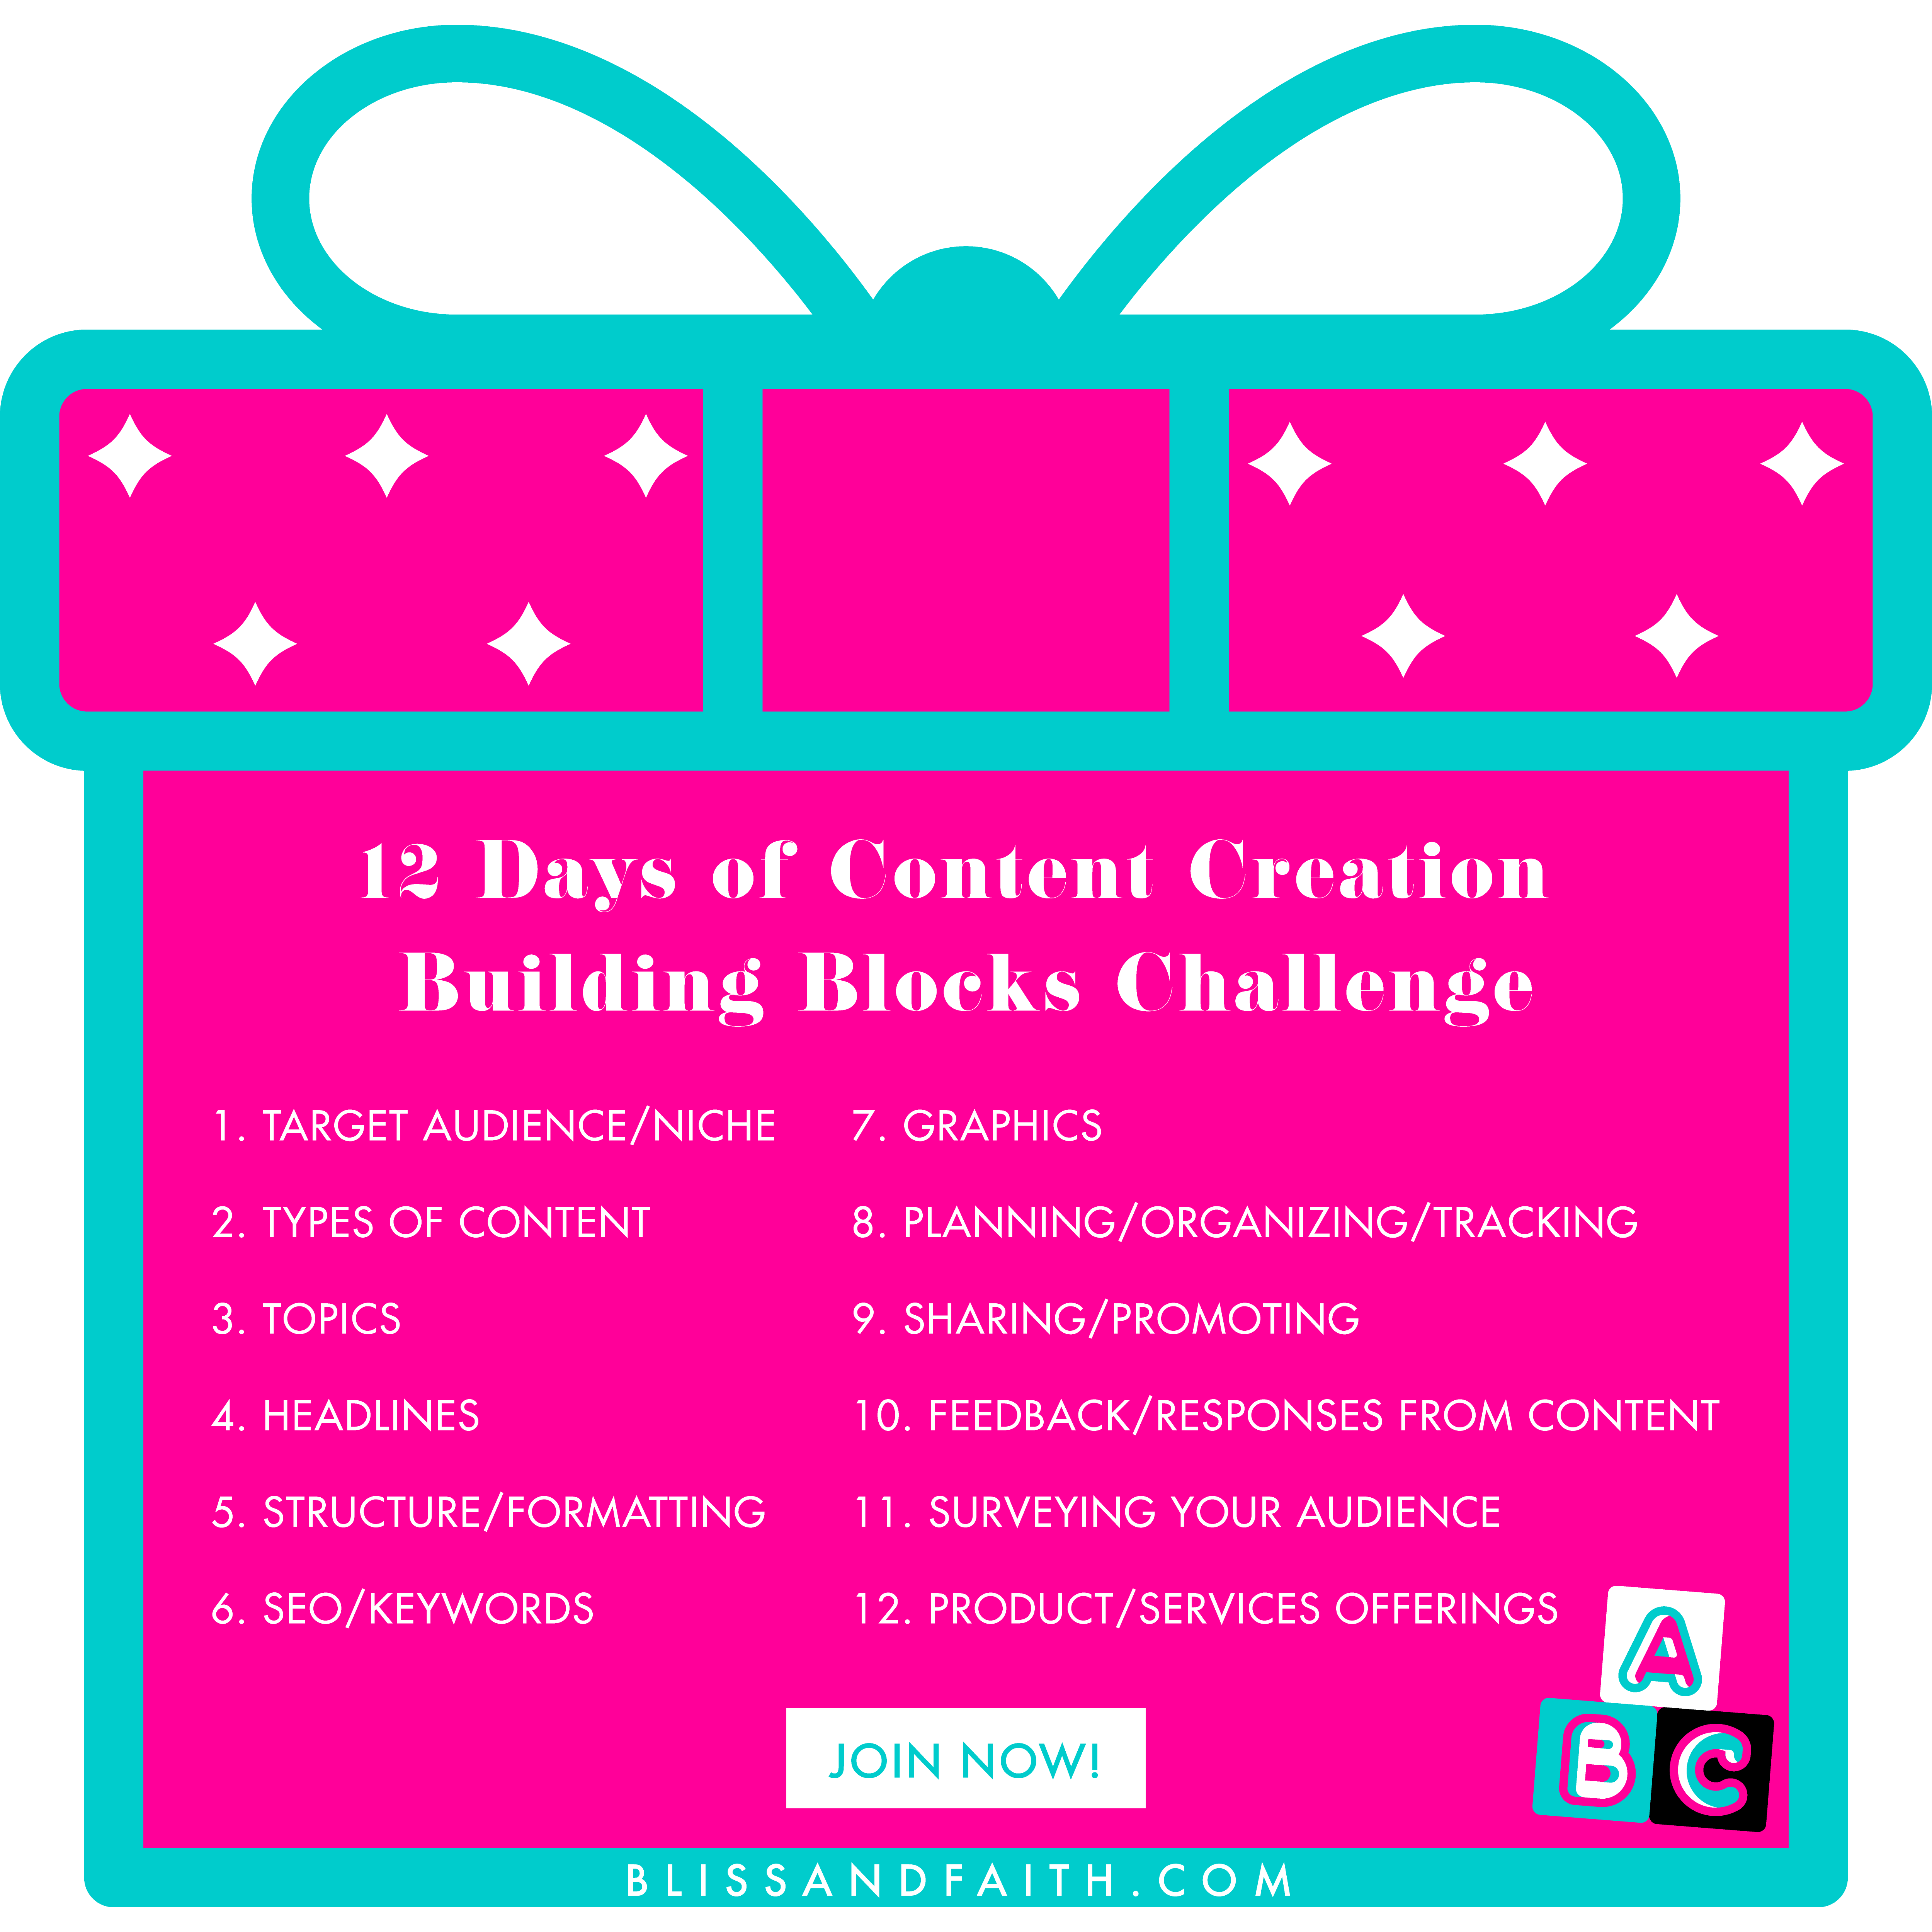 12 Days of Content Creation Building Blocks Challenge | BlissandFaith.com